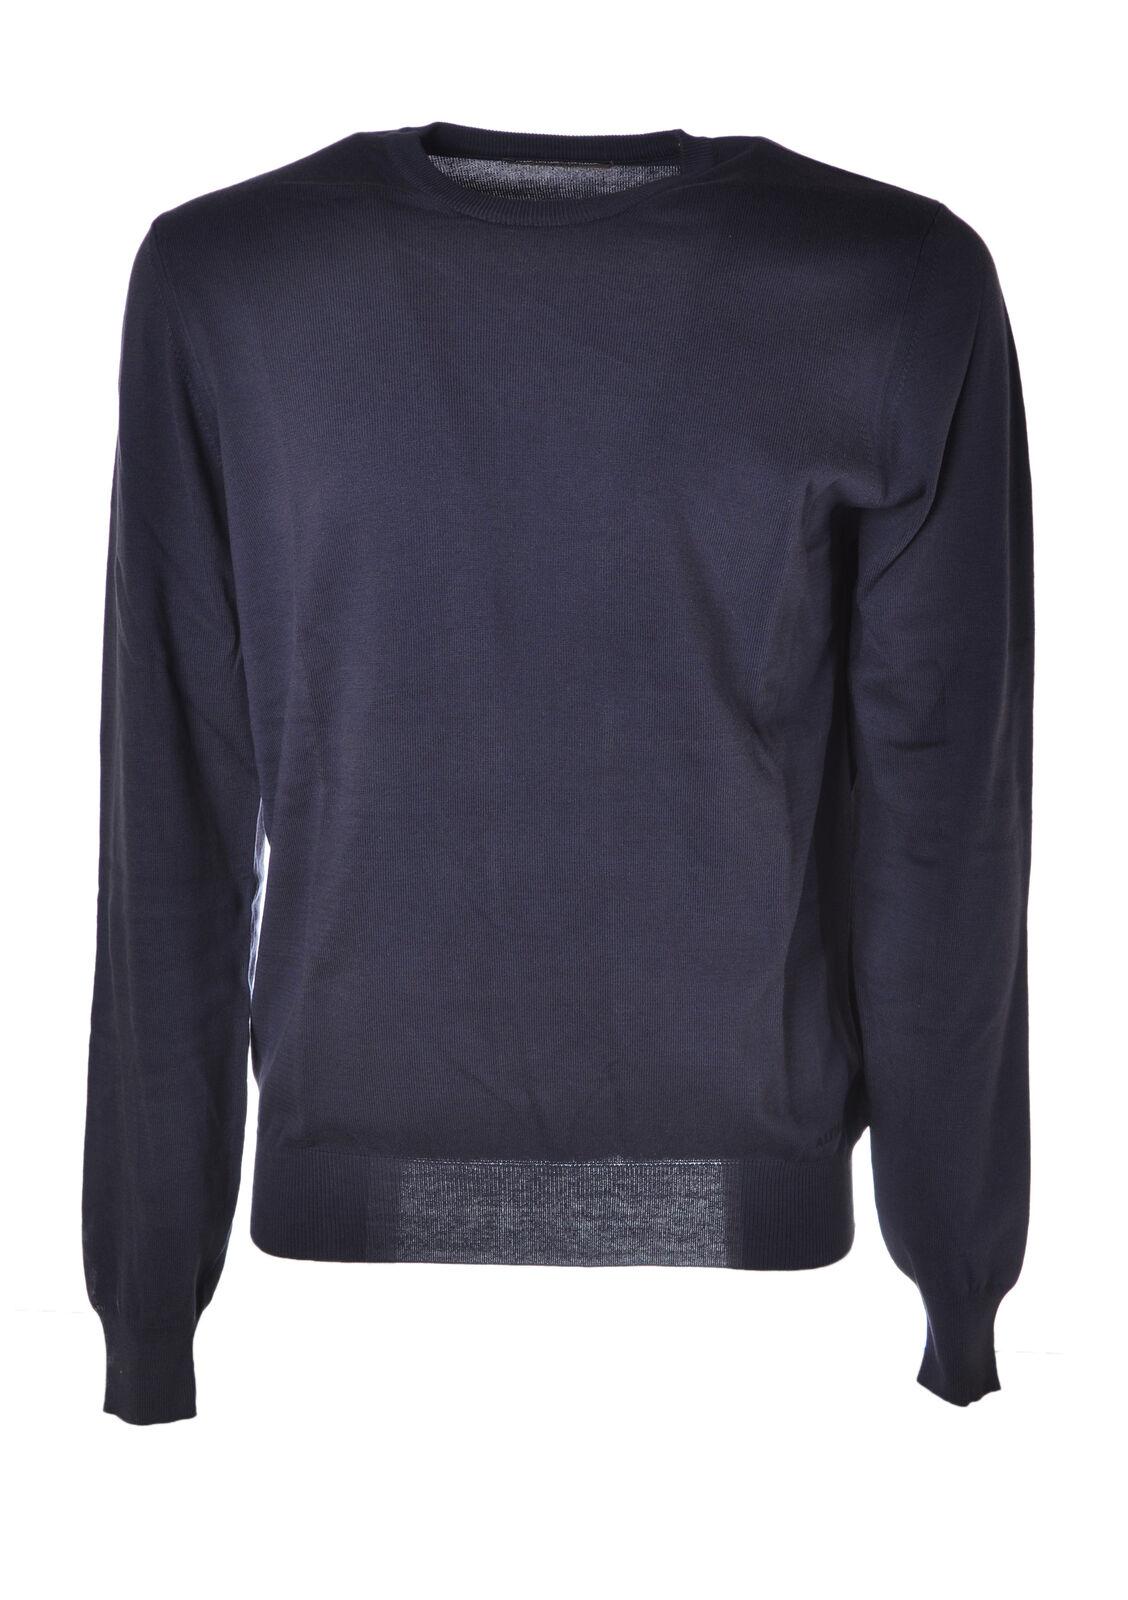 Alpha  -  Sweaters - Male - Blau - 4549923A185401